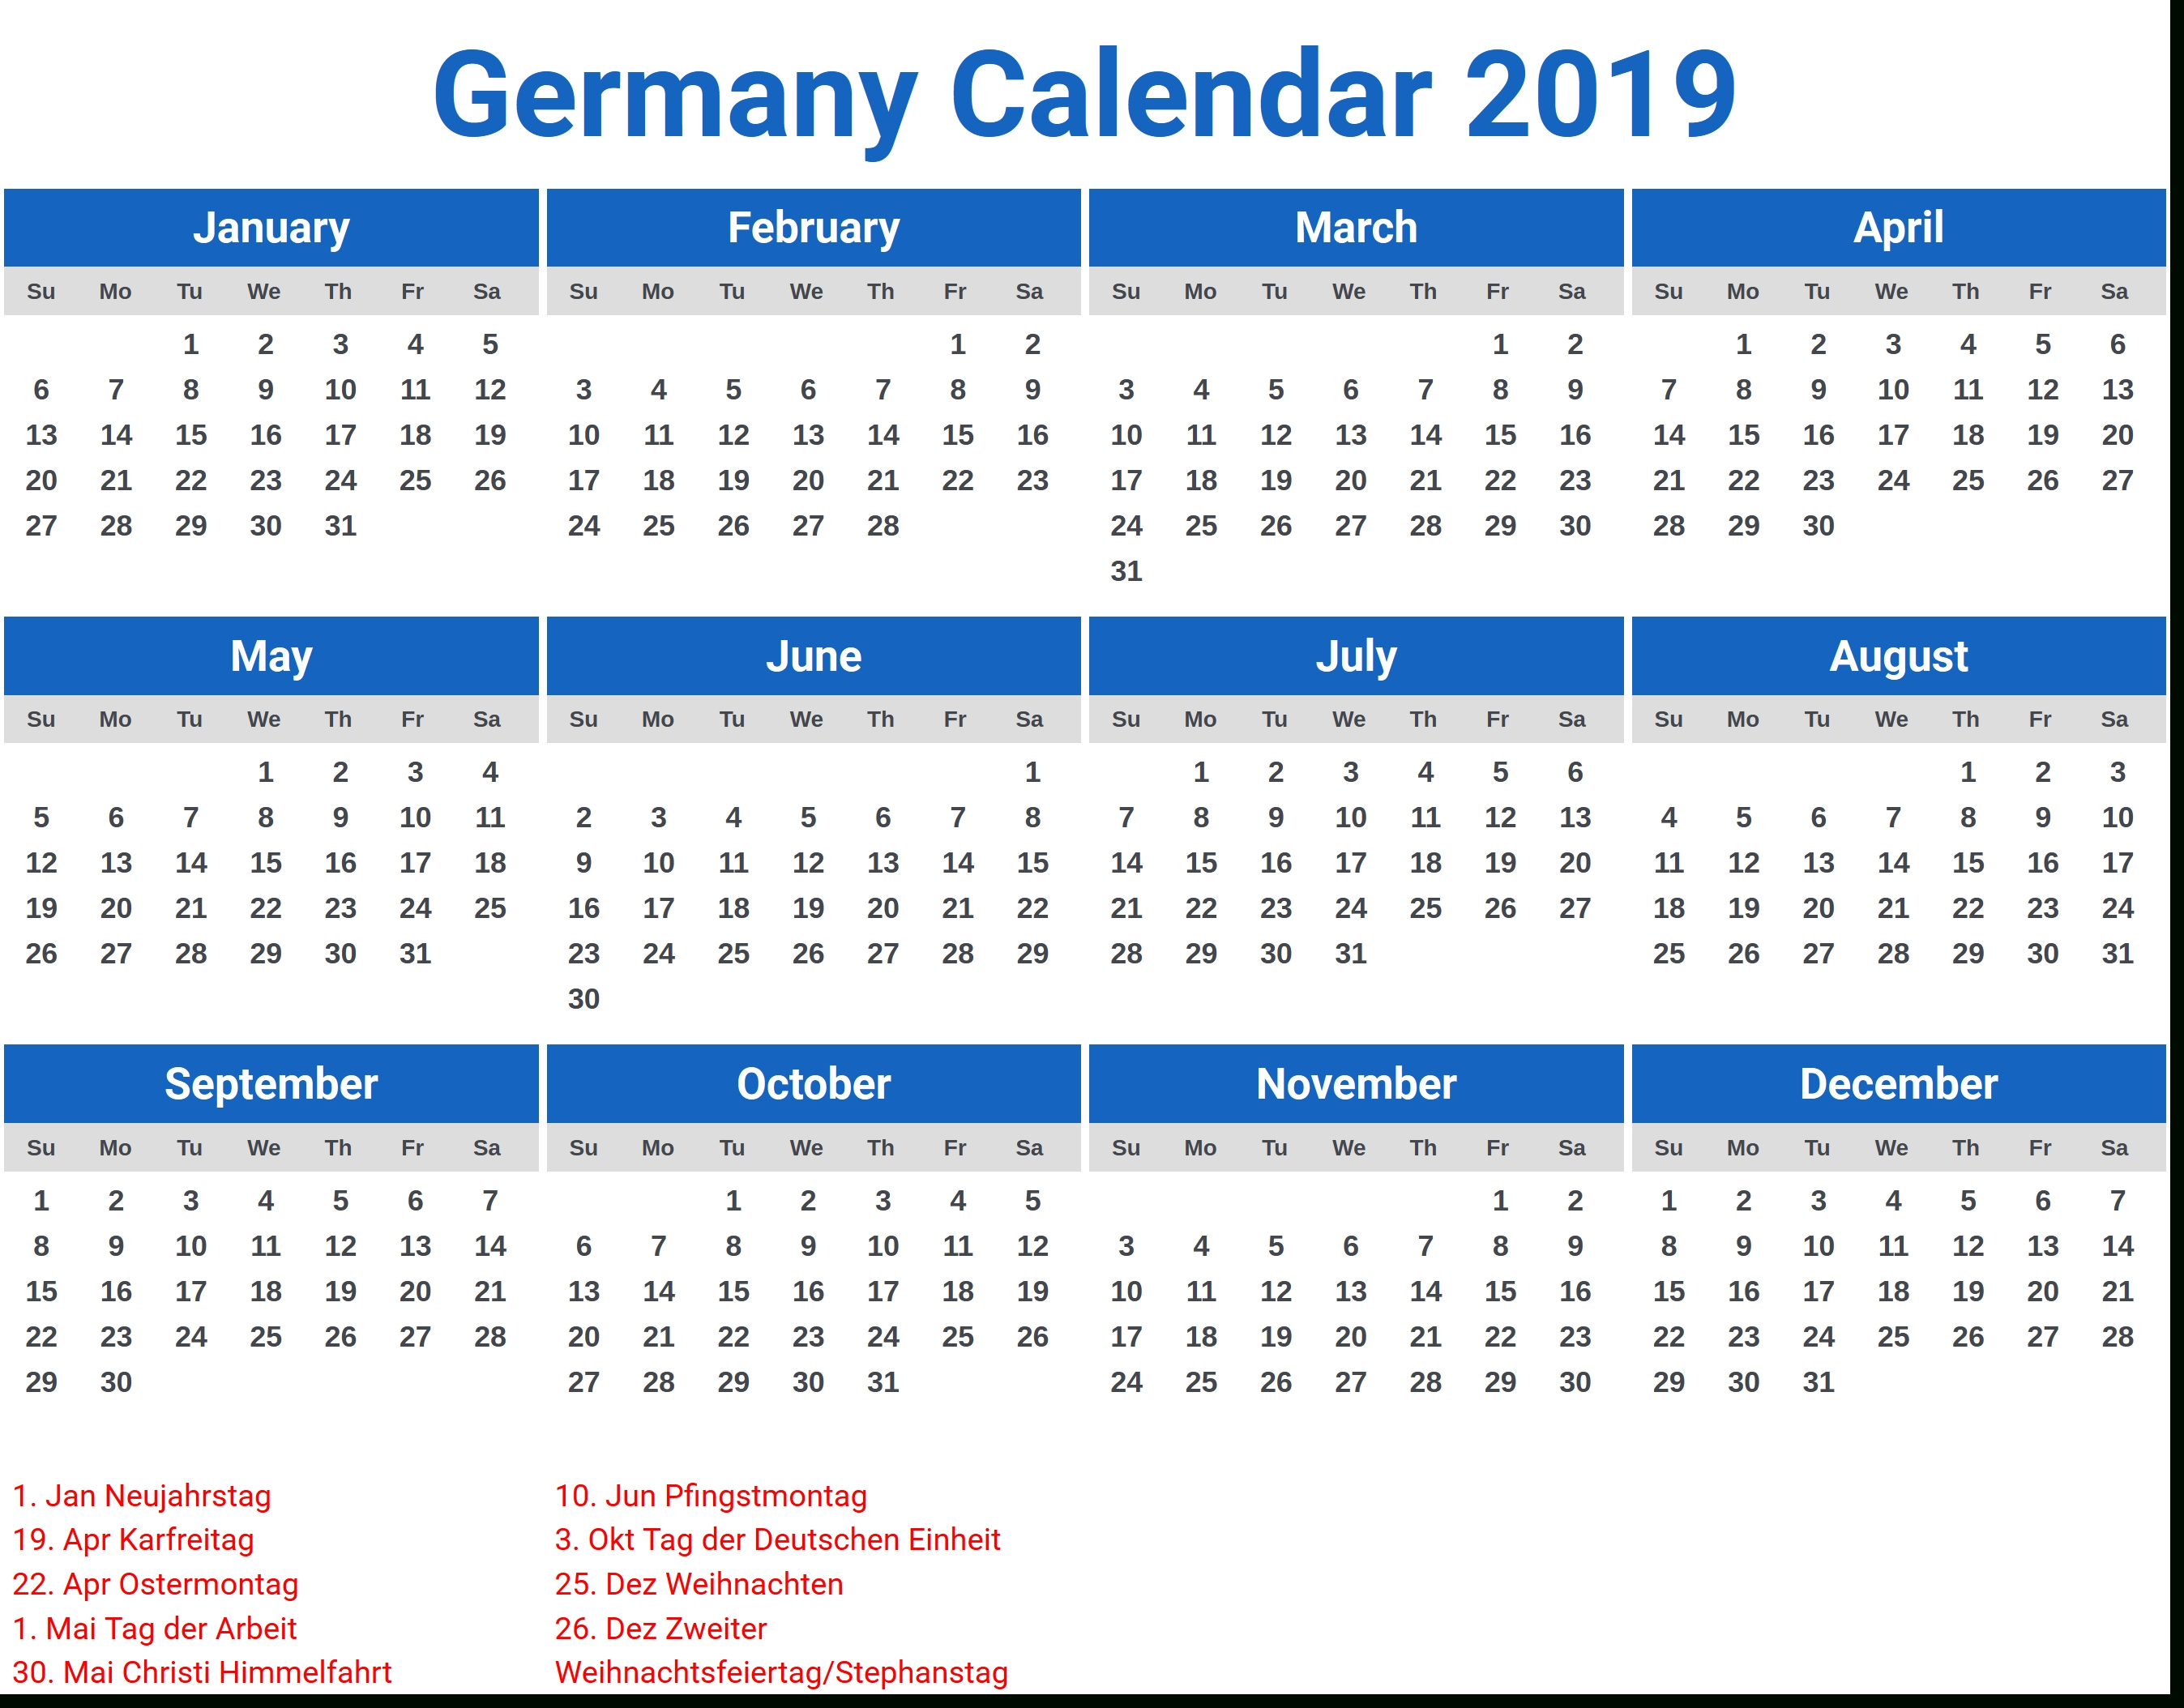 Germany 2019 Calendar With Holidays | 2019 Calendars | Pinterest Calendar 2019 Germany Holidays